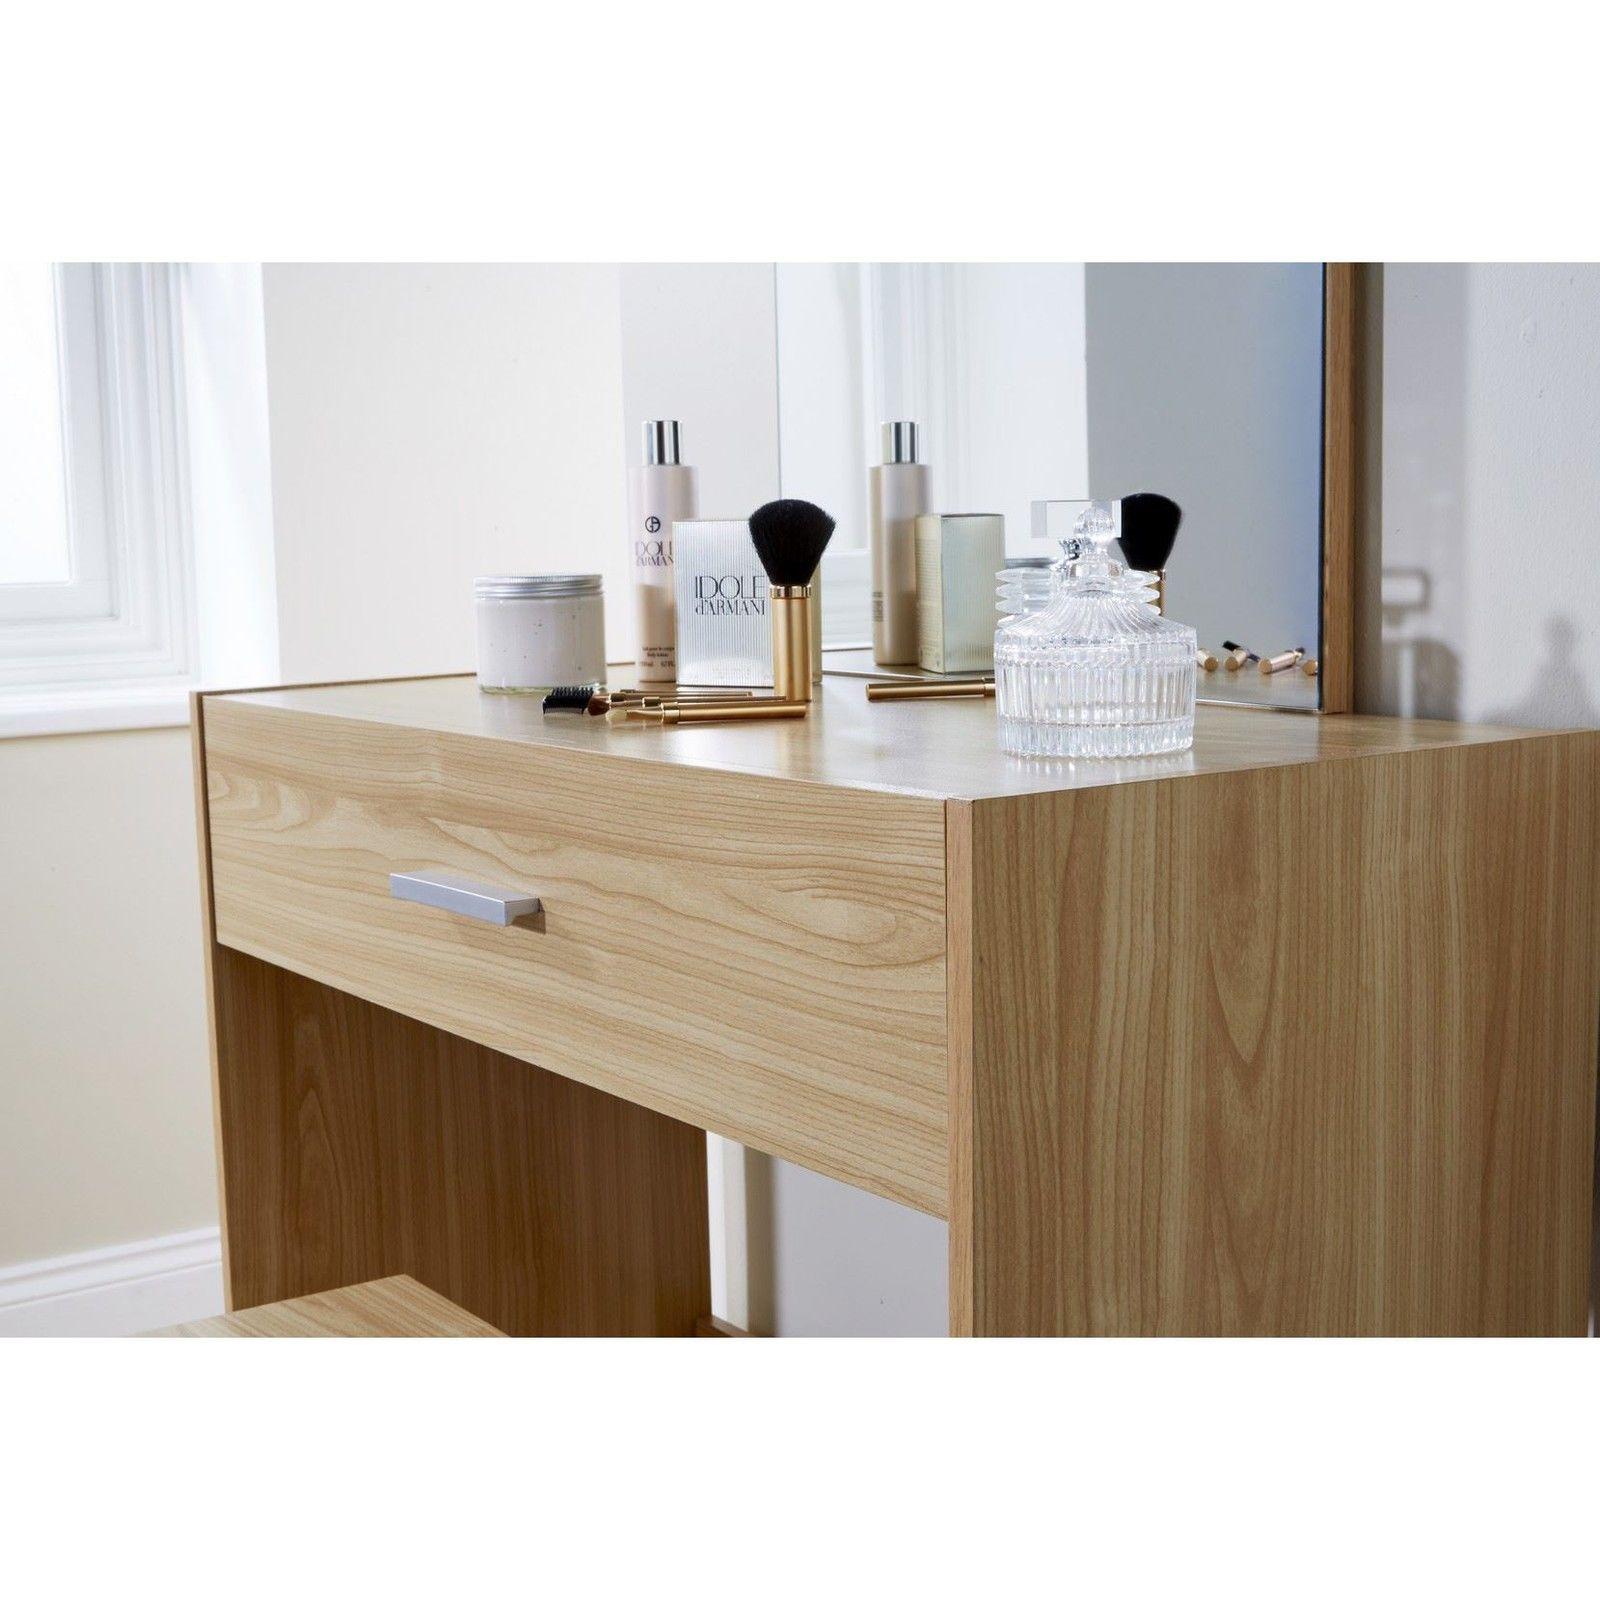 New makeup dressing table oak julia set w stool mirror for Oak makeup table